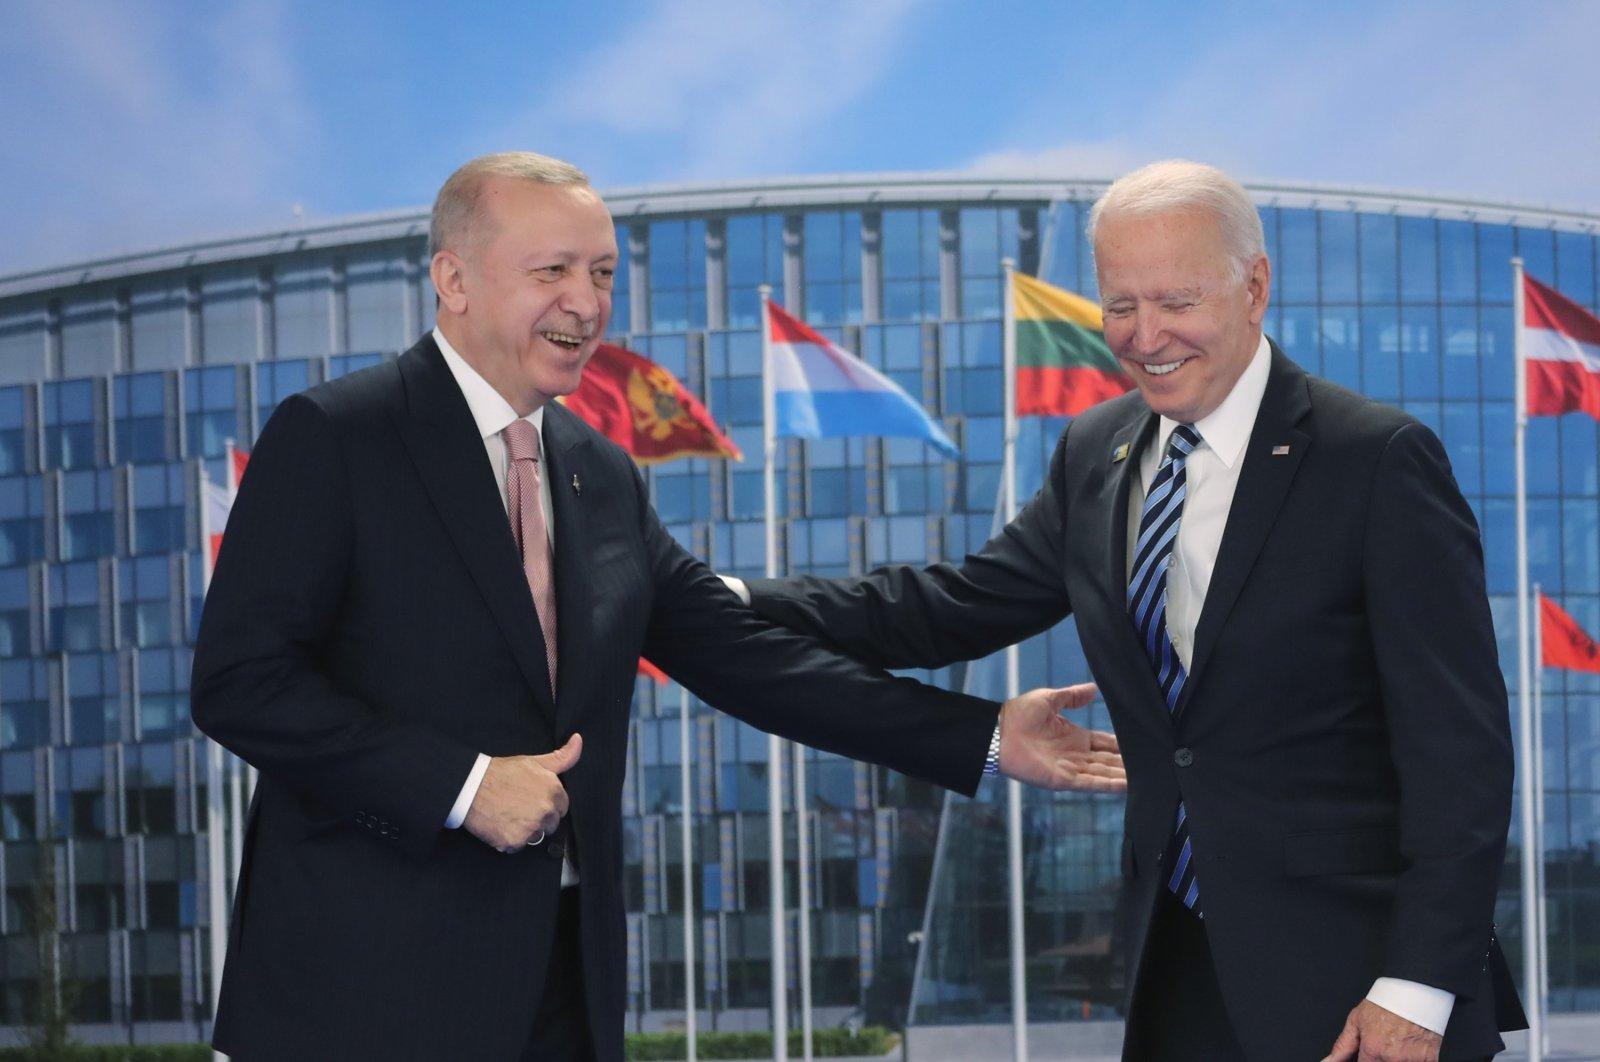 President Recep Tayyip Erdoğan and his U.S. counterpart Joe Biden gesture during their meeting at the NATO headquarters in Brussels, Belgium, June 14, 2021. (DHA Photo)